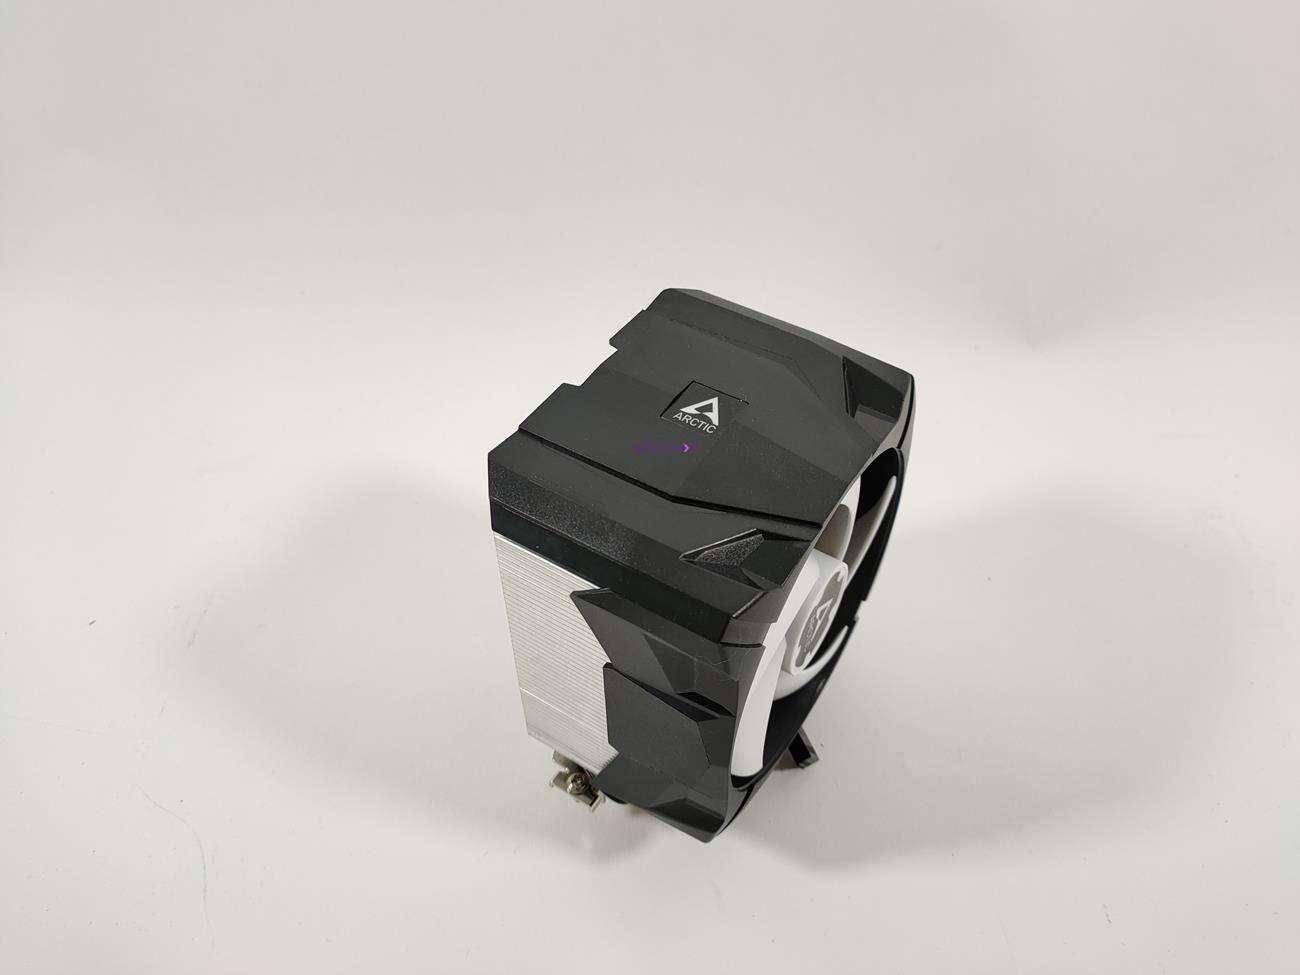 test Arctic Freezer 7X, recenzja Arctic Freezer 7X, review Arctic Freezer 7X, opinia Arctic Freezer 7X